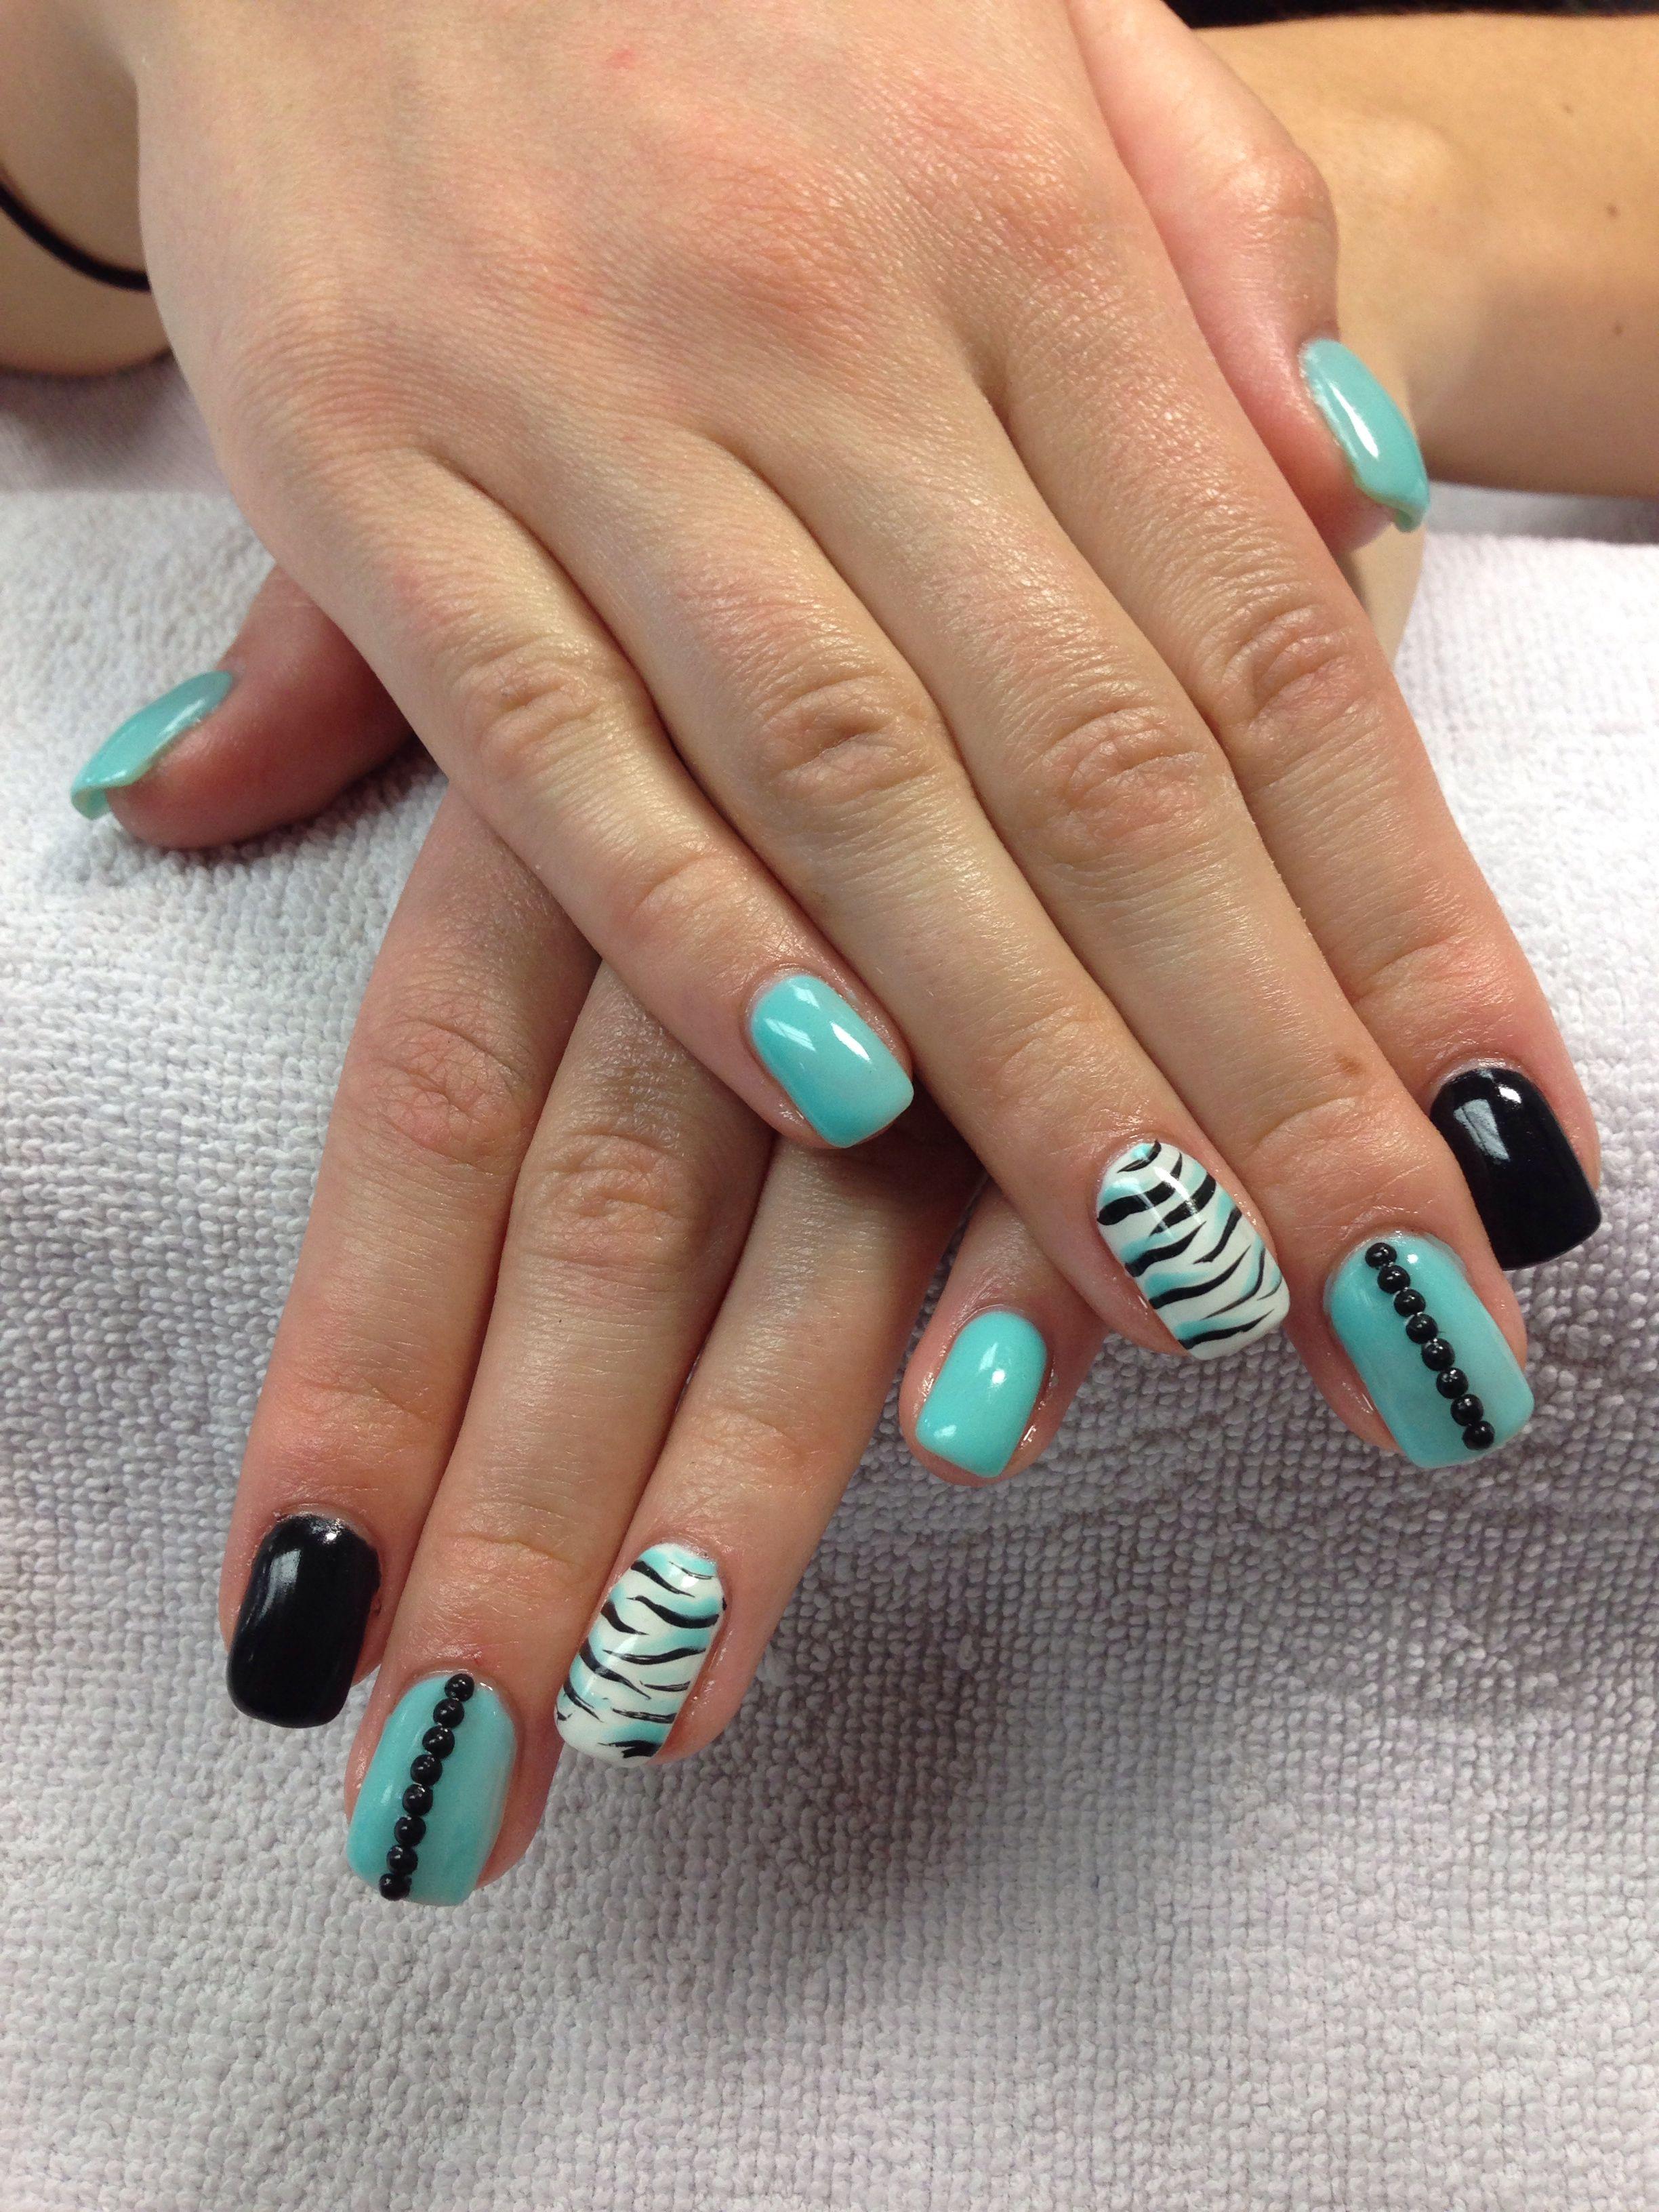 uñas verde menta negro animal print | Diseño de uñas | Pinterest ...